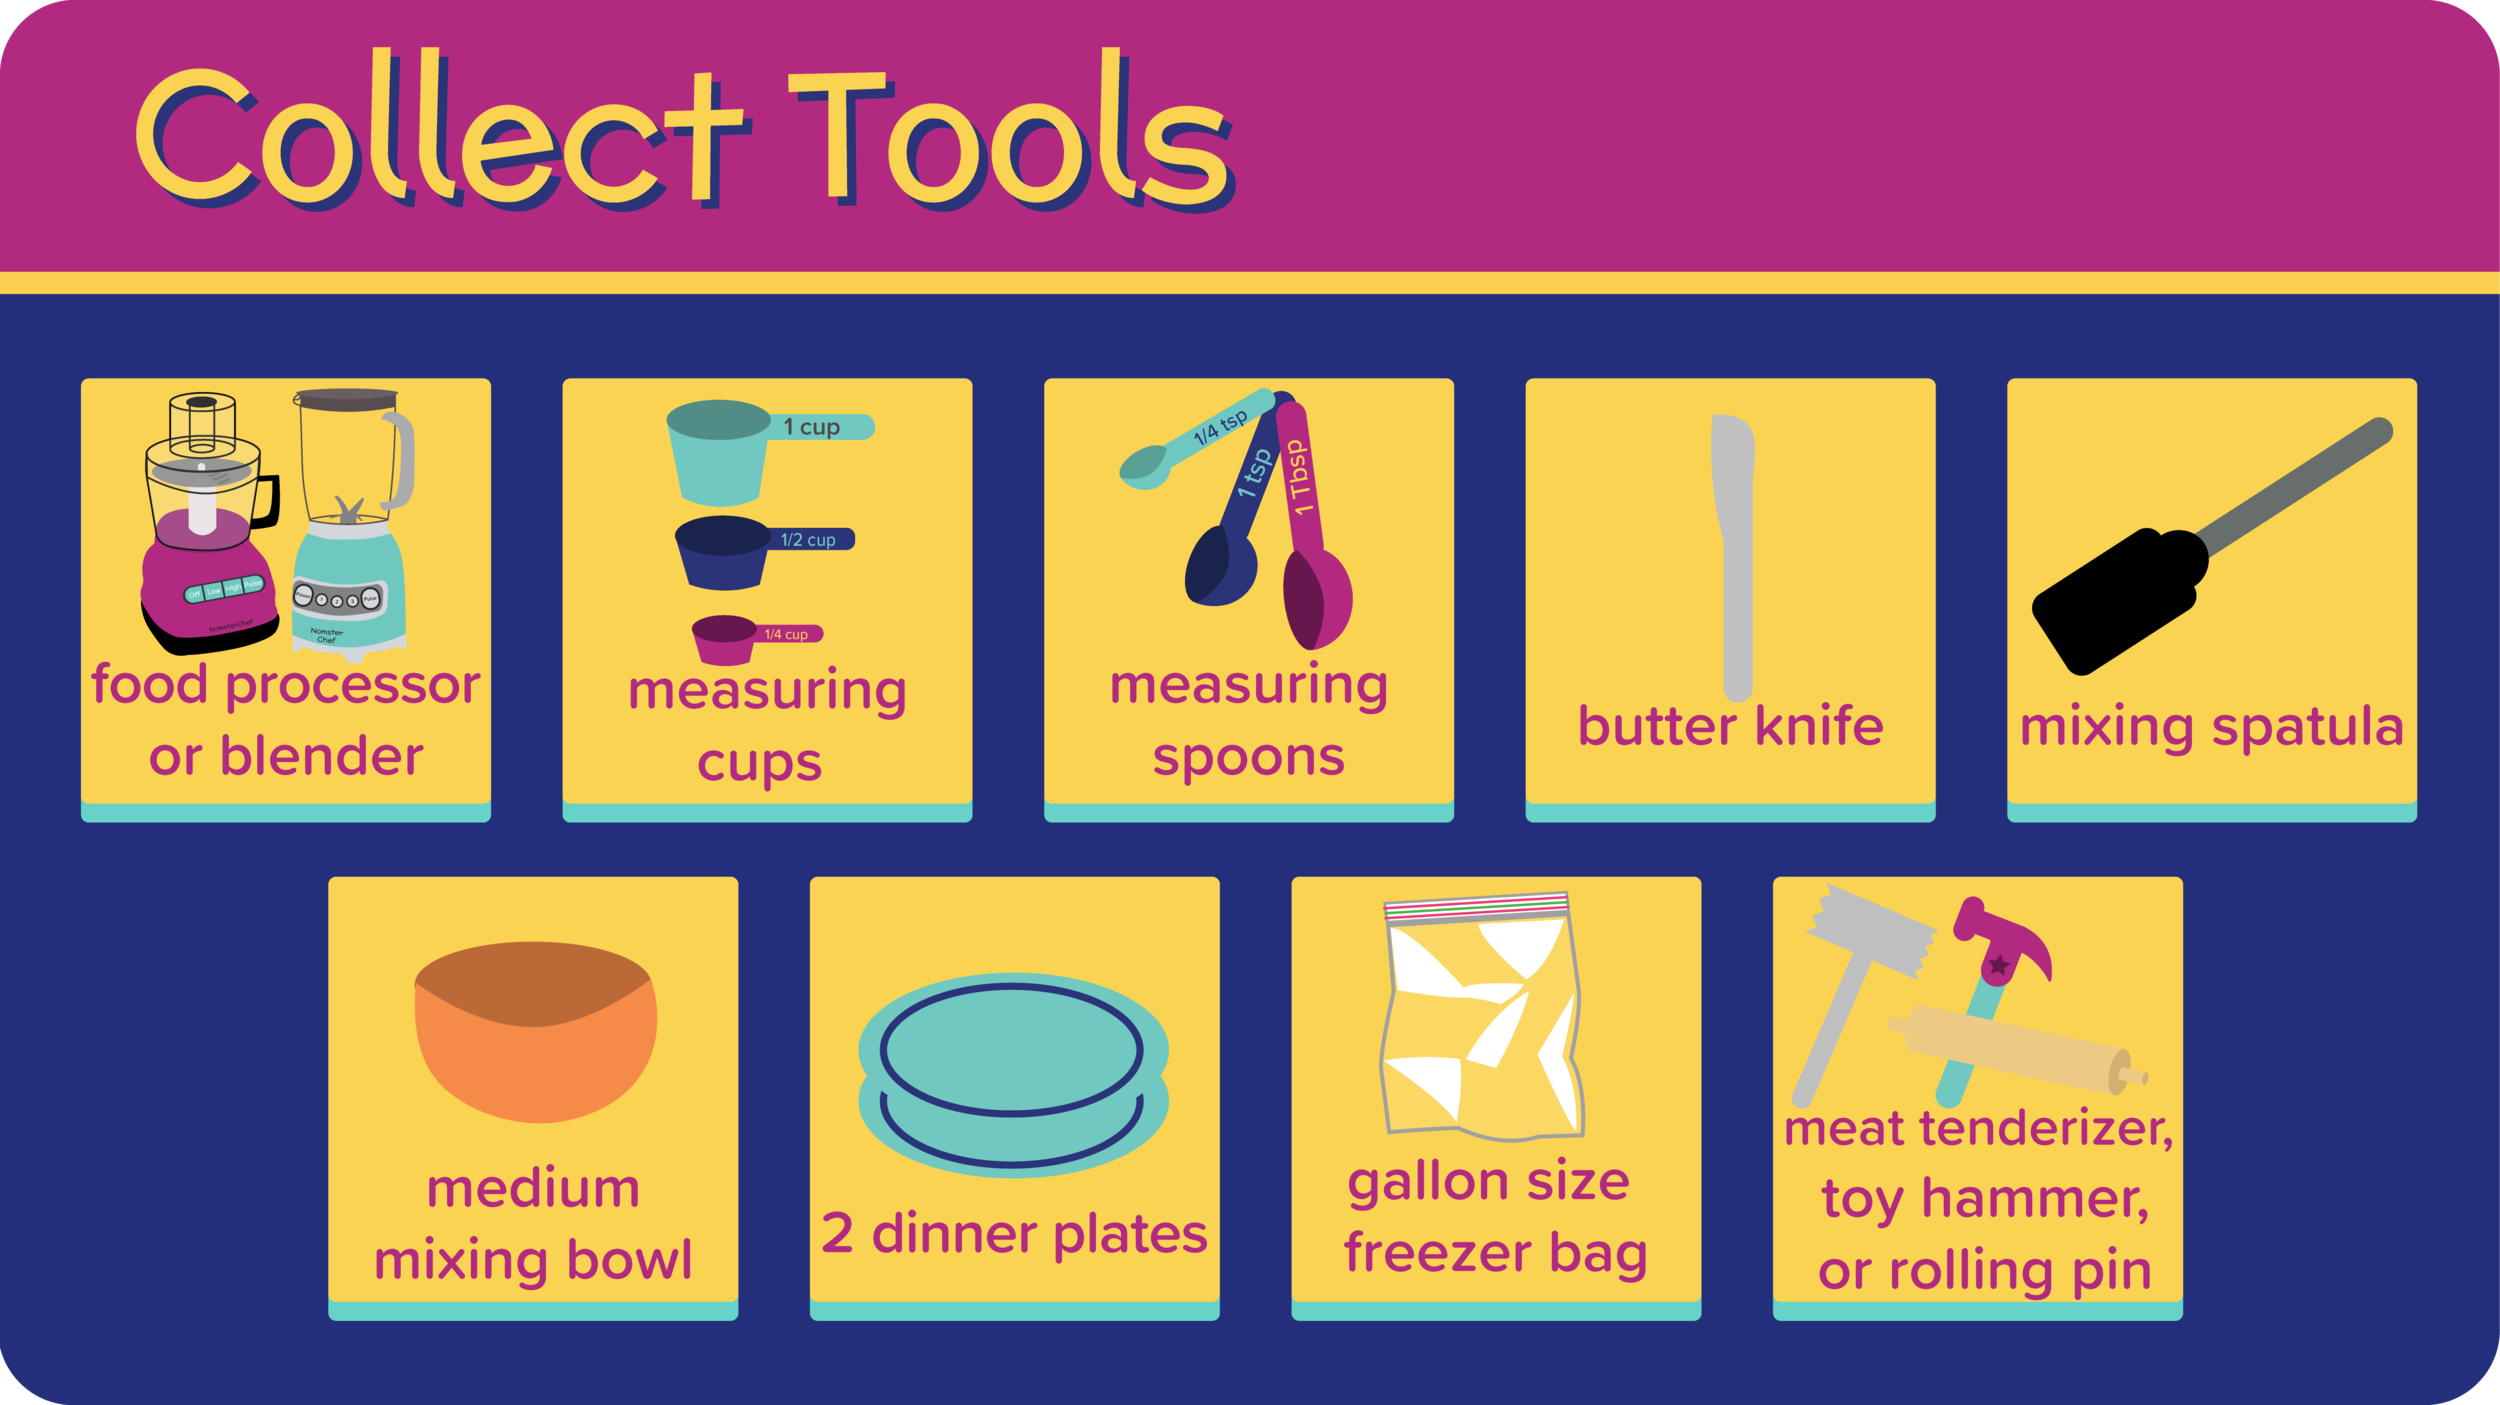 06_MintyChocolateDateBalls_Collect Tools-01.png